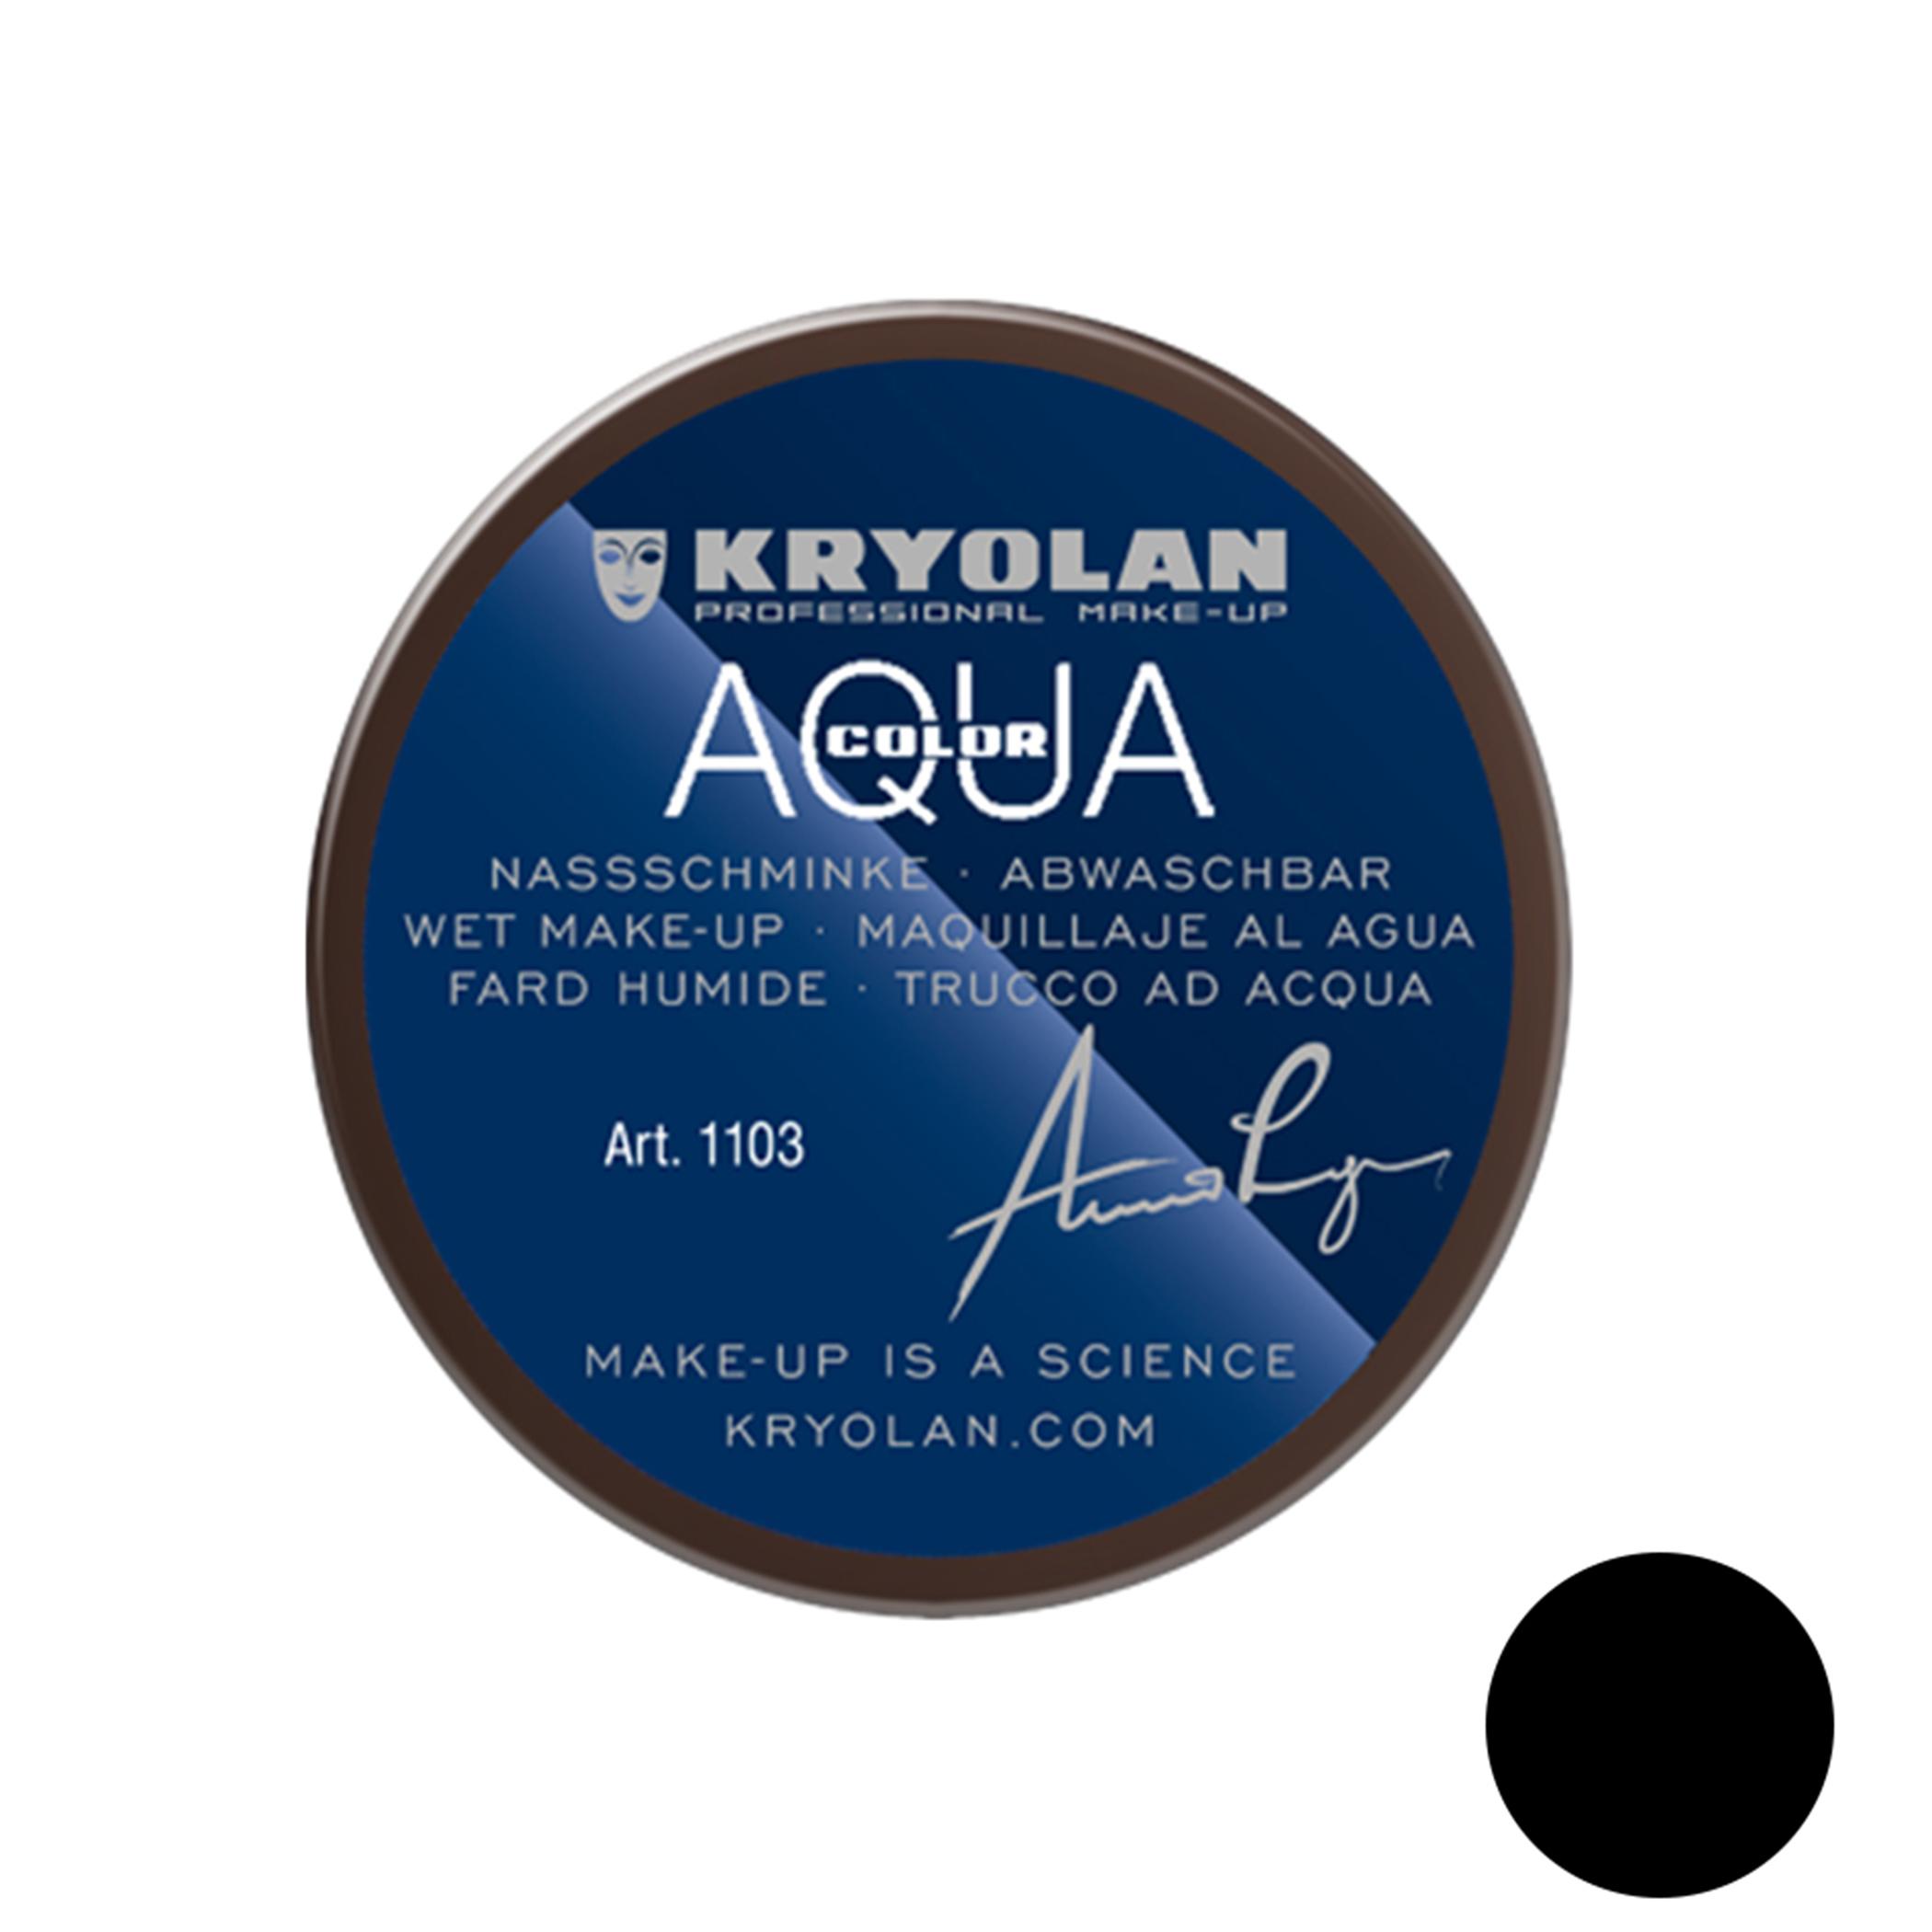 خط چشم کریولان مدل آکوا شماره 071